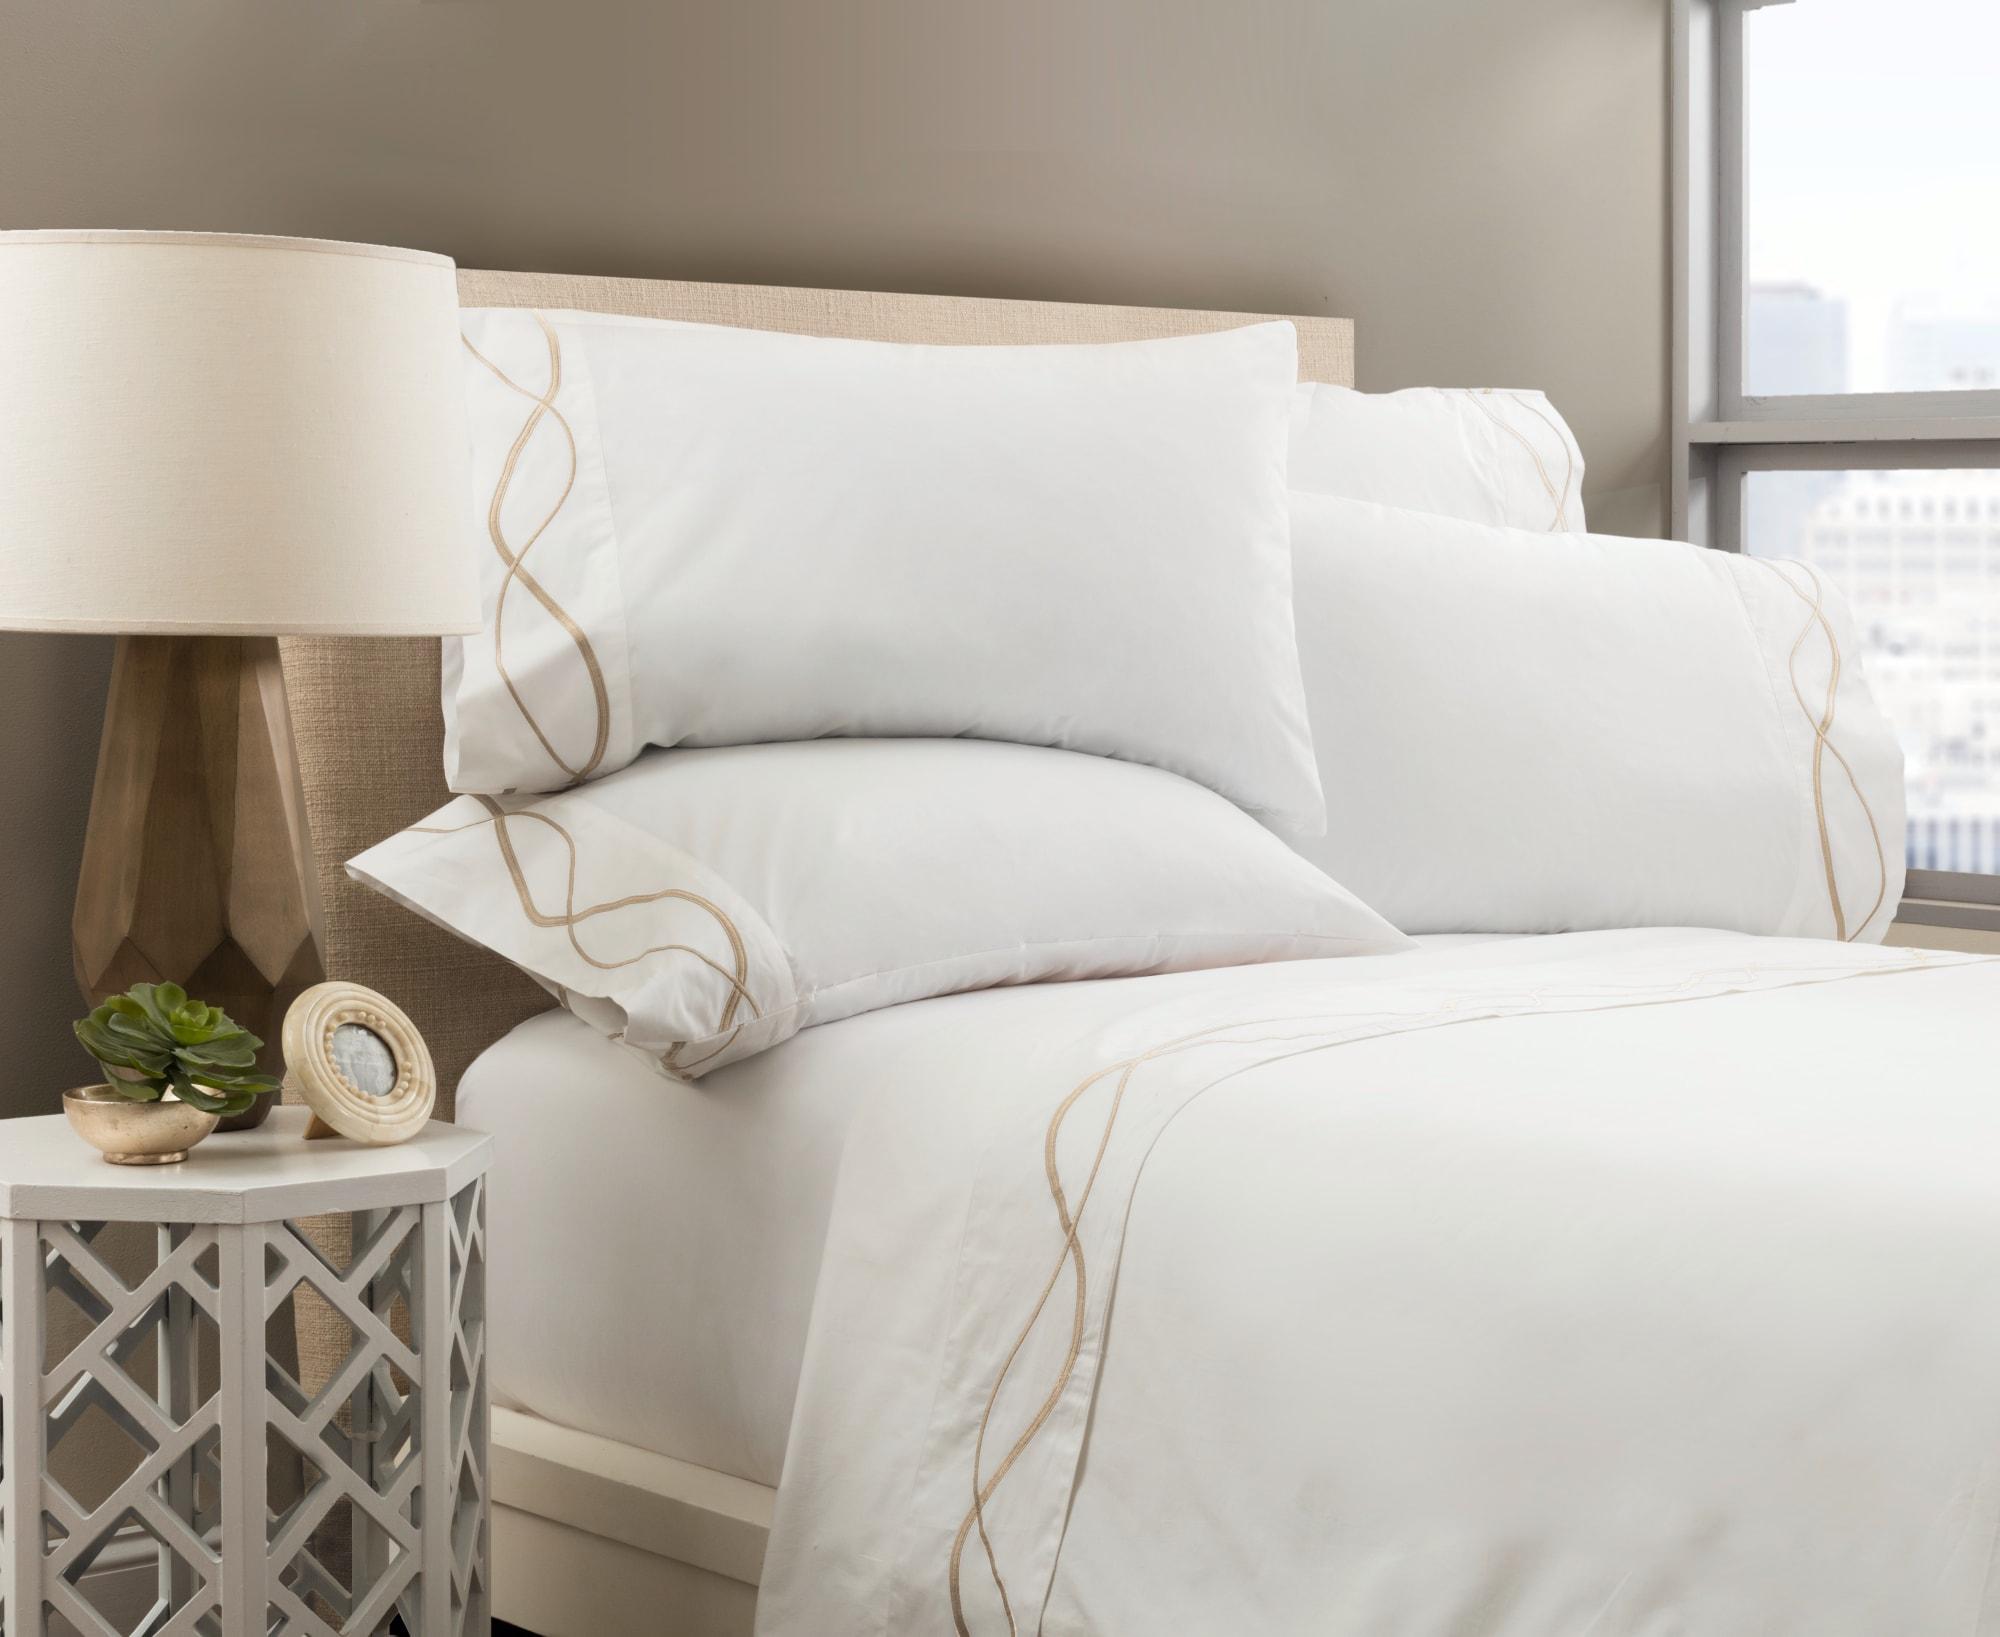 Linens & Bedding by ELEGANT STRAND seen at Private Residence - Boca Raton, FL, Boca Raton - Capri Embroidered Sheet Set